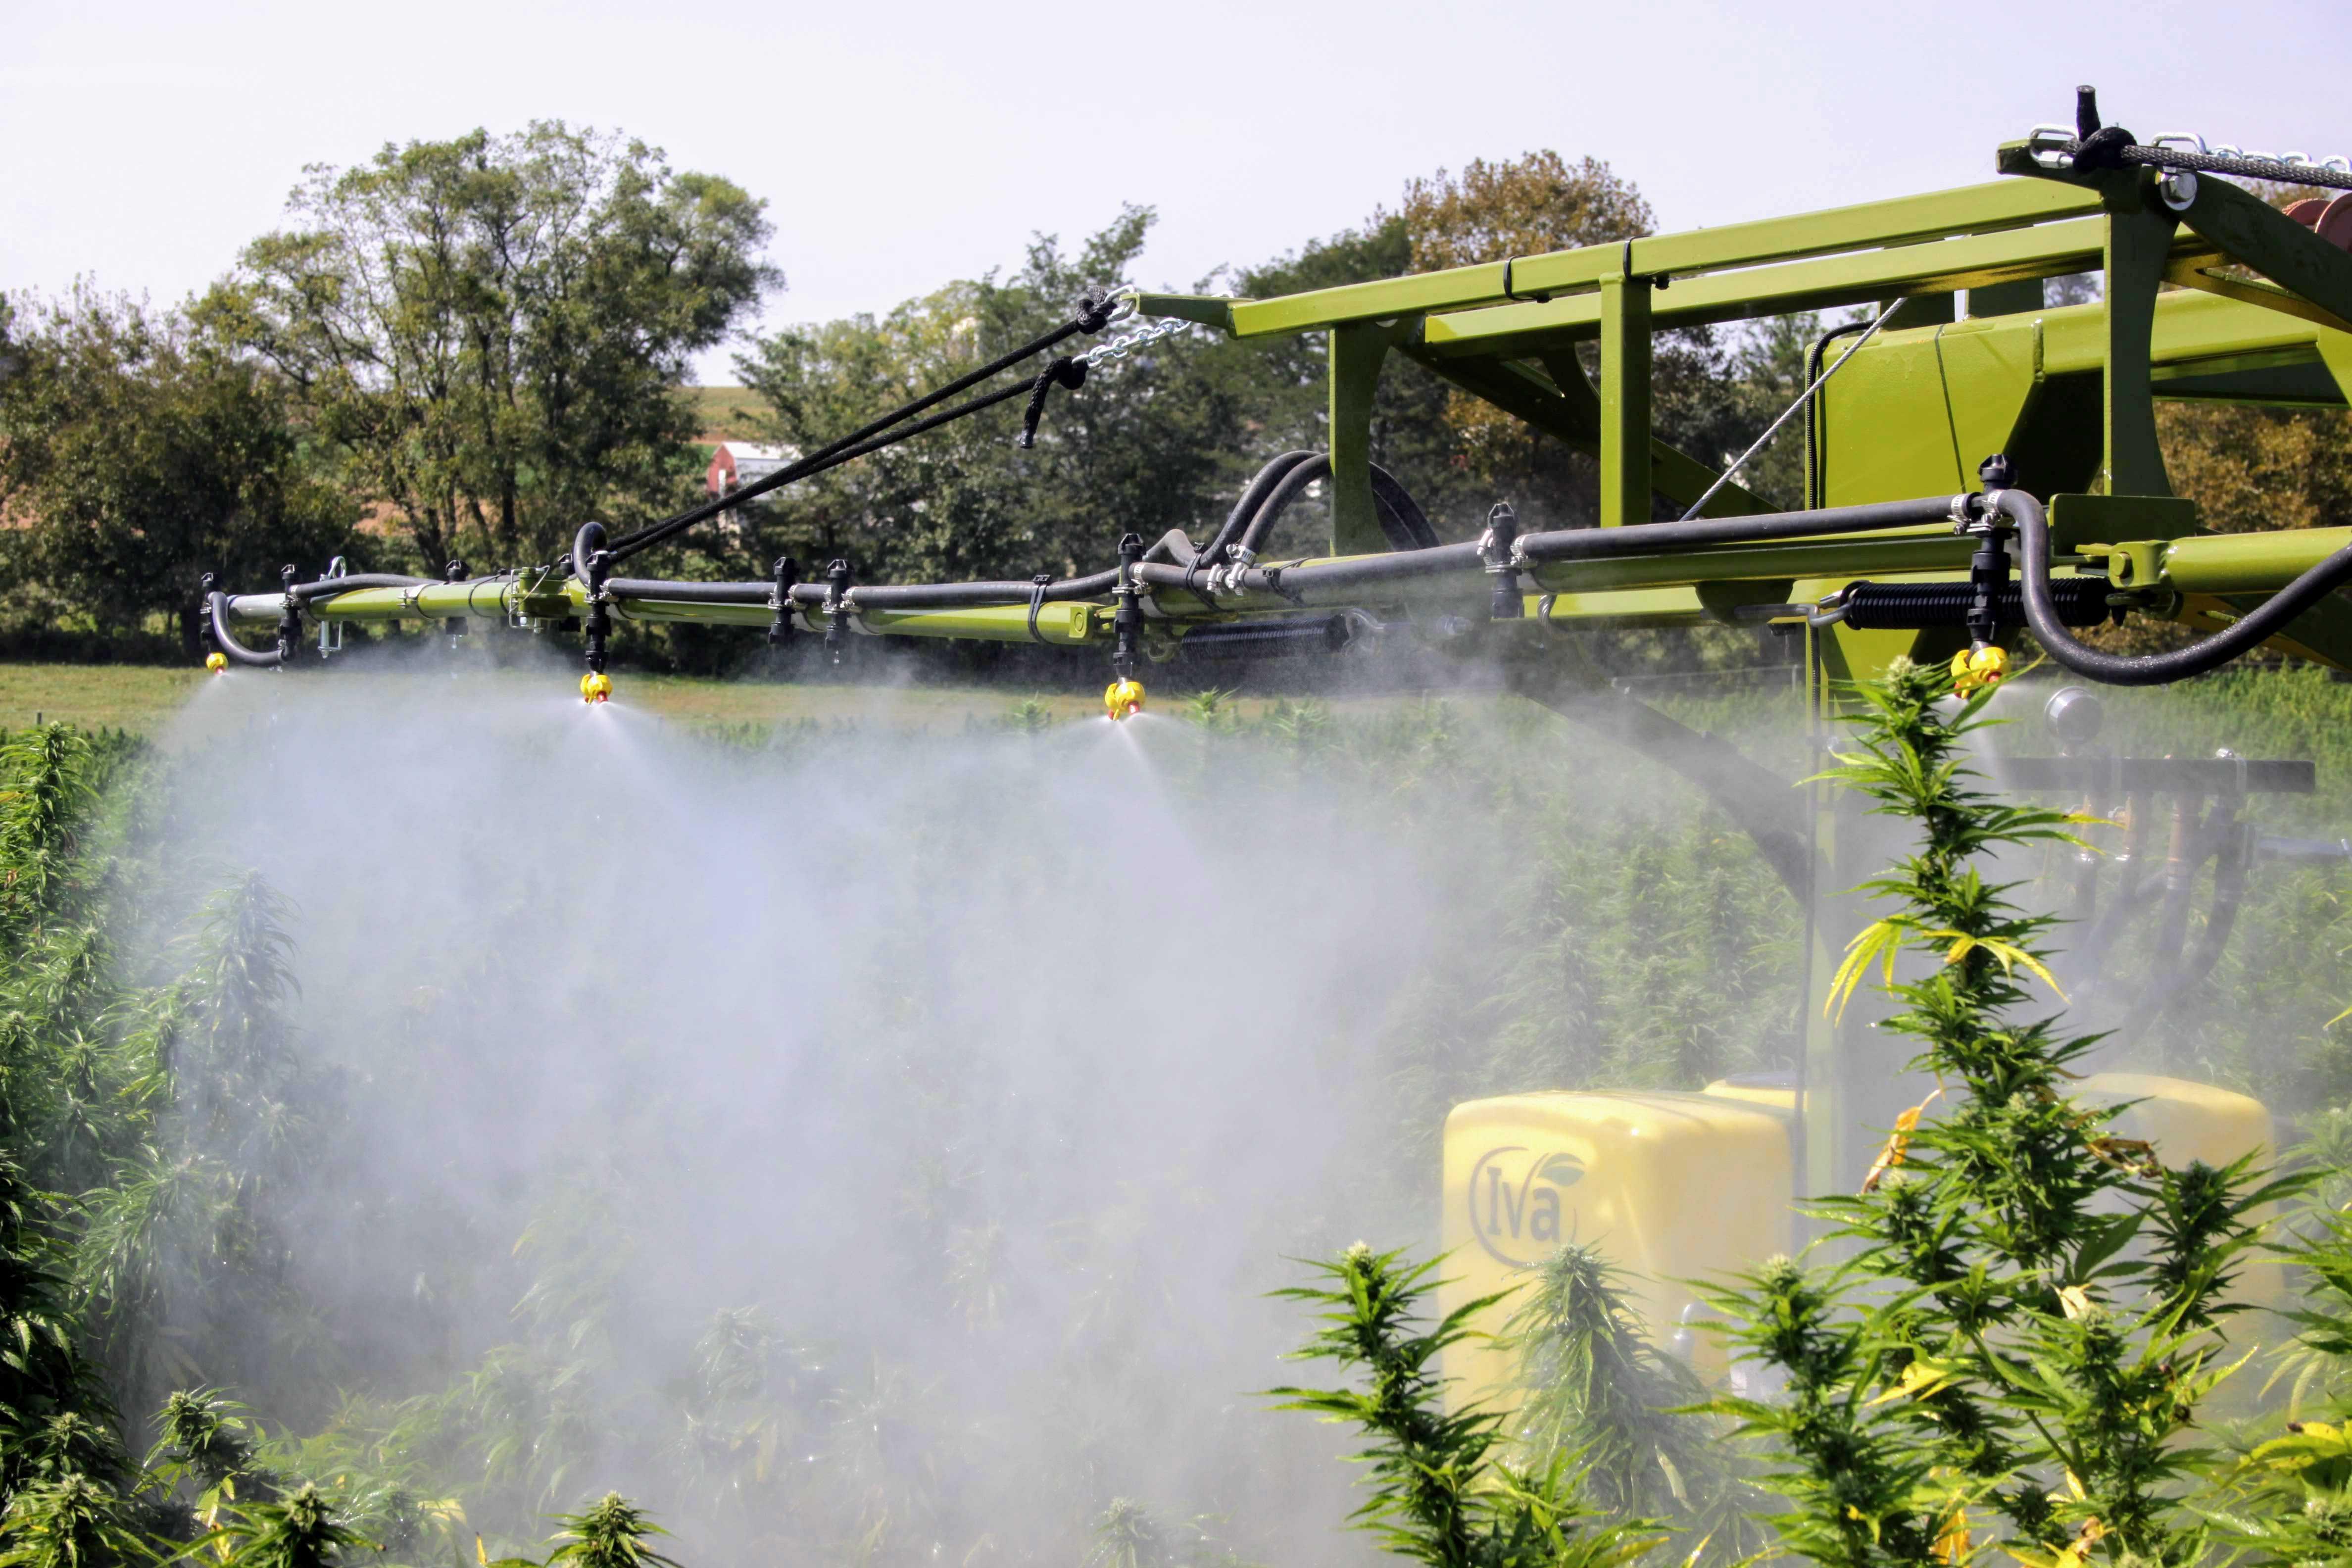 Angled nozzles on industrial hemp sprayer